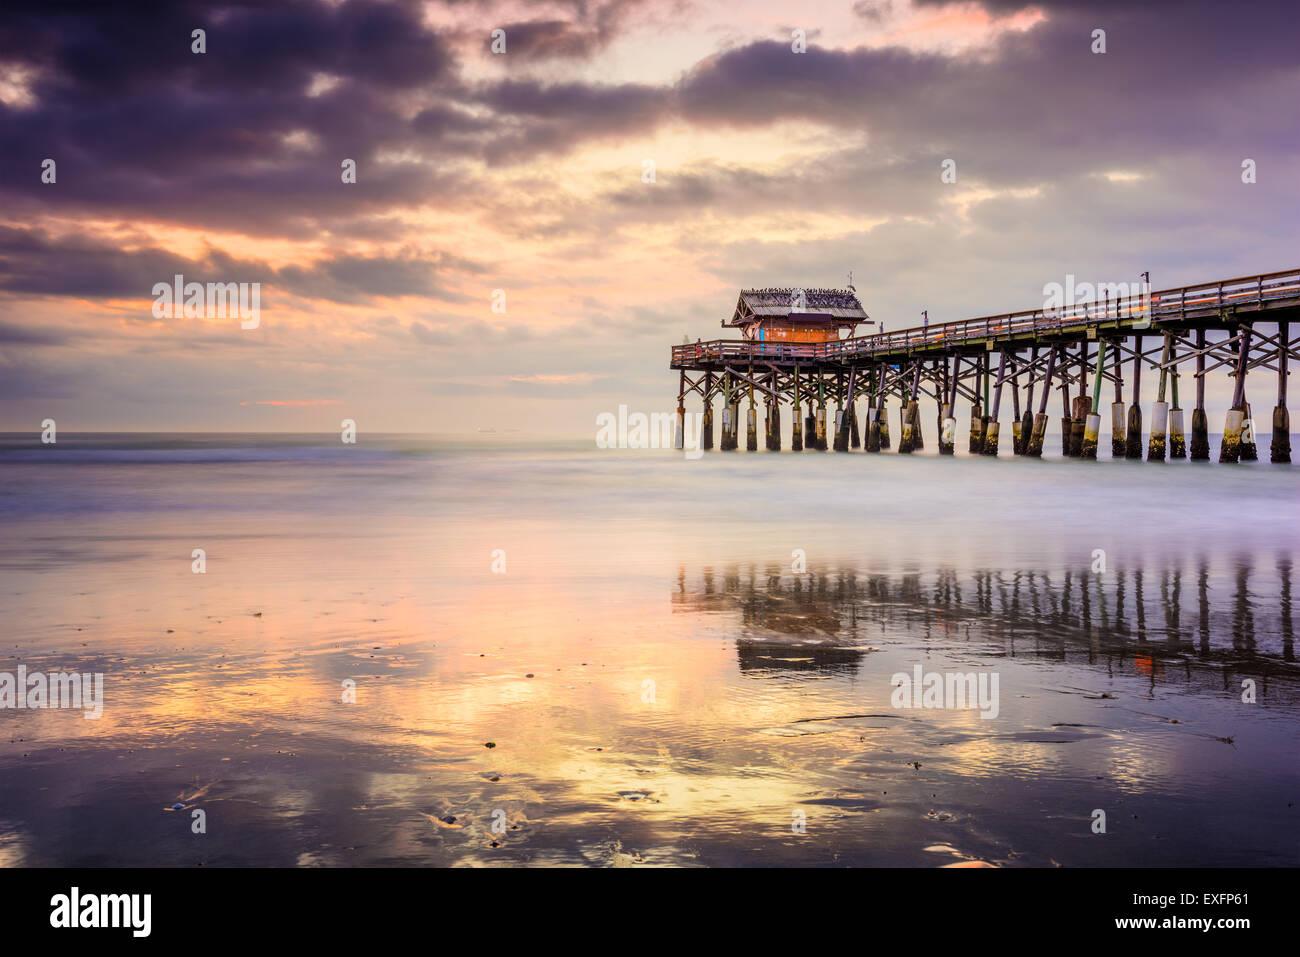 Cocoa Beach, Florida, USA am Pier. Stockbild